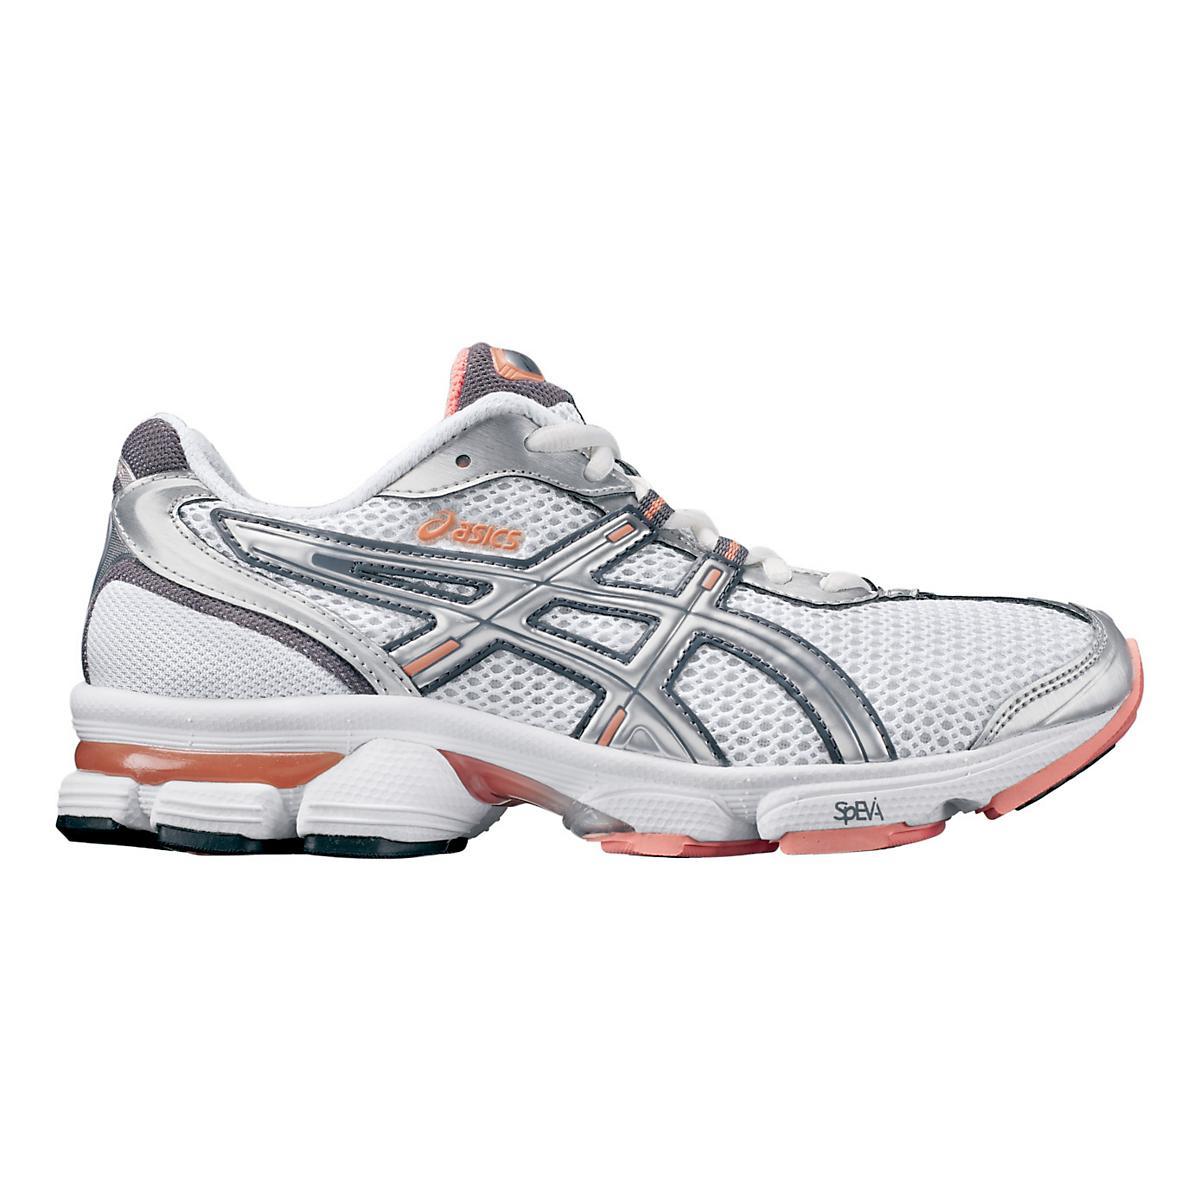 b2d0fd2855 Womens ASICS GEL-Stratus Running Shoe at Road Runner Sports